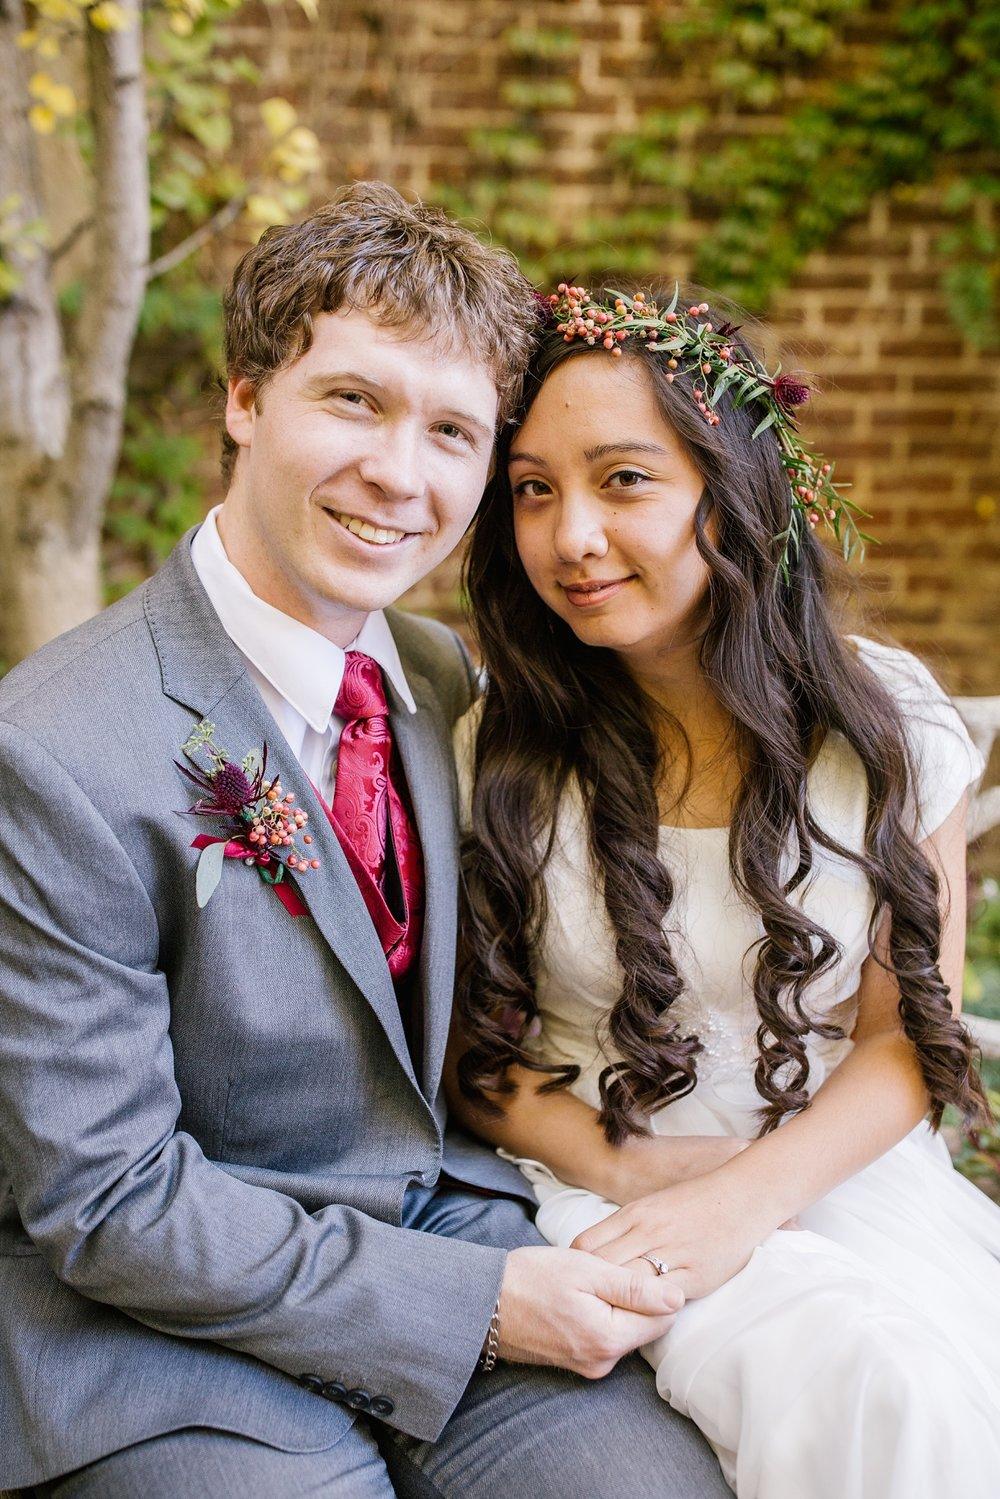 JB-Bridals-77_Lizzie-B-Imagery-Utah-Wedding-Photographer-Thanksgiving-Point-Ashton-Gardens-Lehi-Utah.jpg